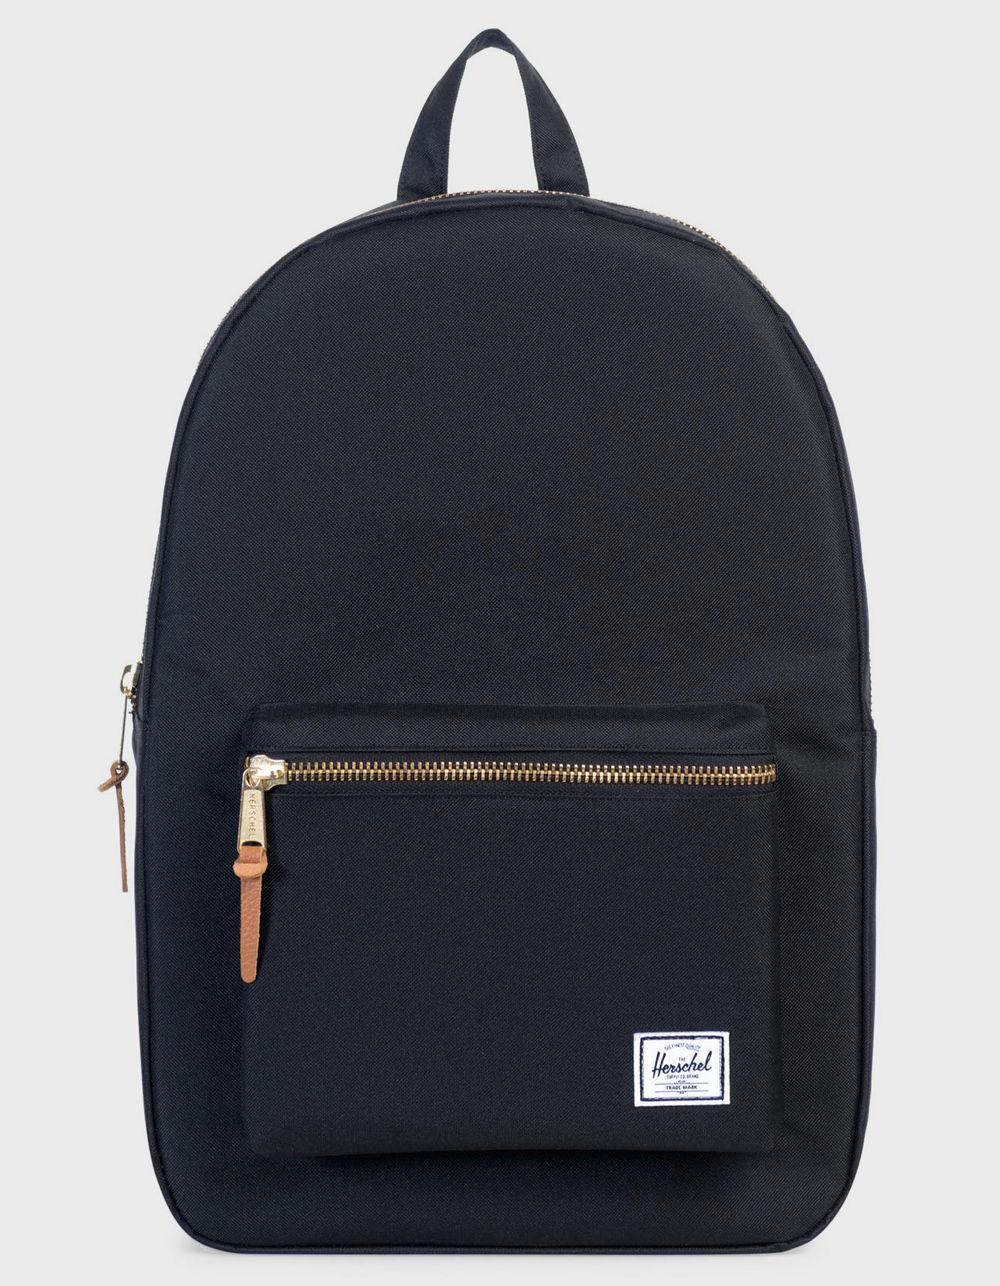 560275eebeb Lyst - Herschel Supply Co. Settlement Black Backpack in Black for Men